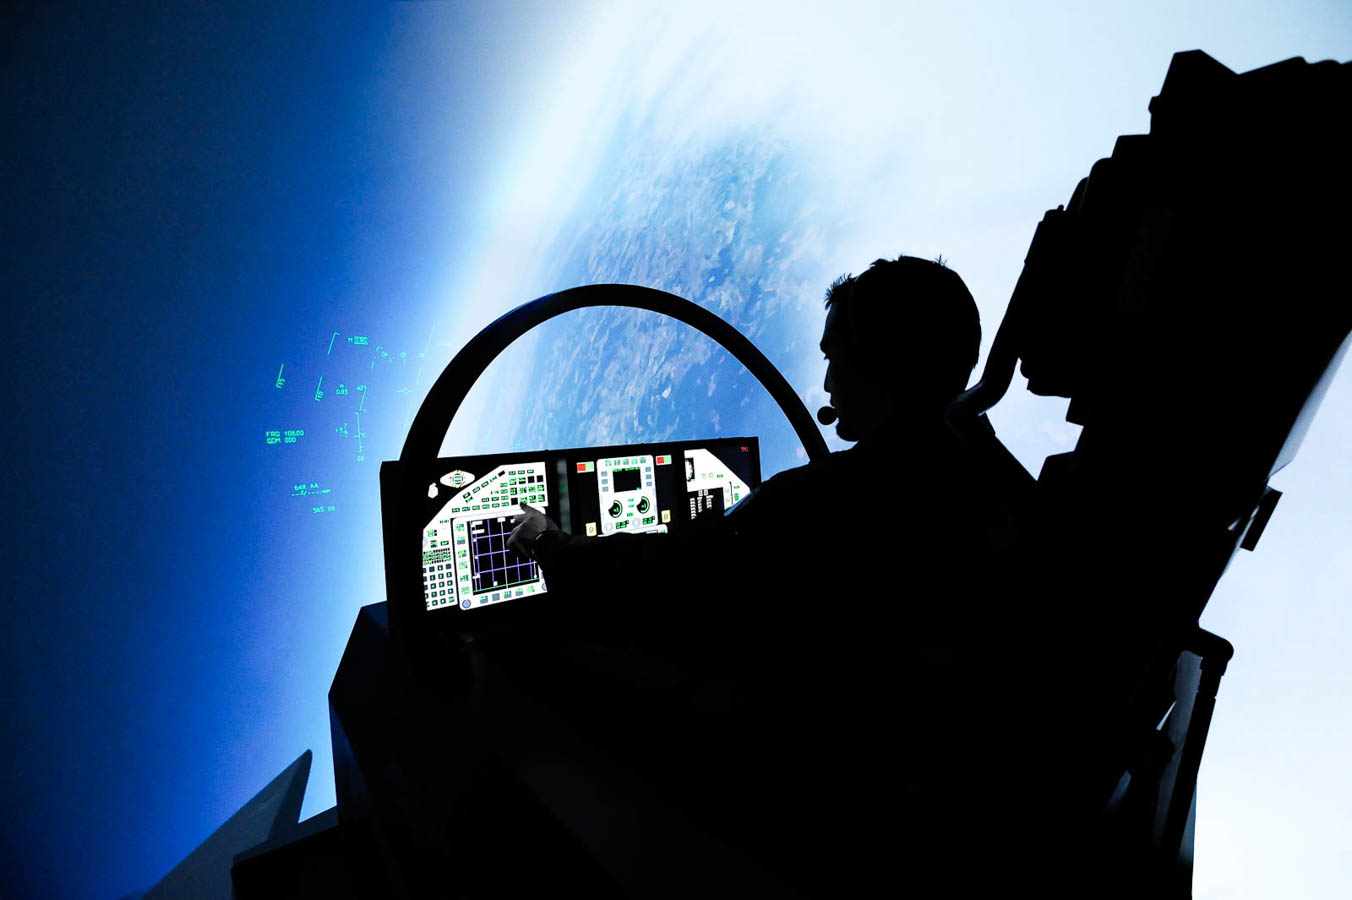 Eurofighter Simulator - 4° Stormo Grosseto - Aeronautica Militare